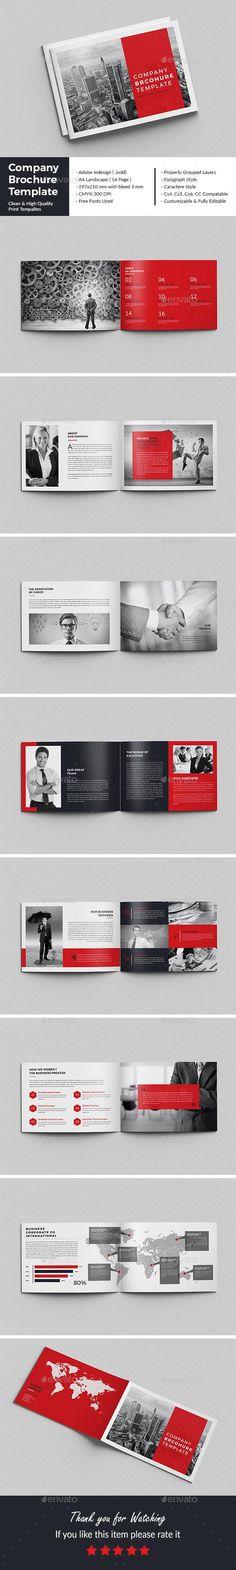 Company Brochure Template - Envato #BestDesignResources